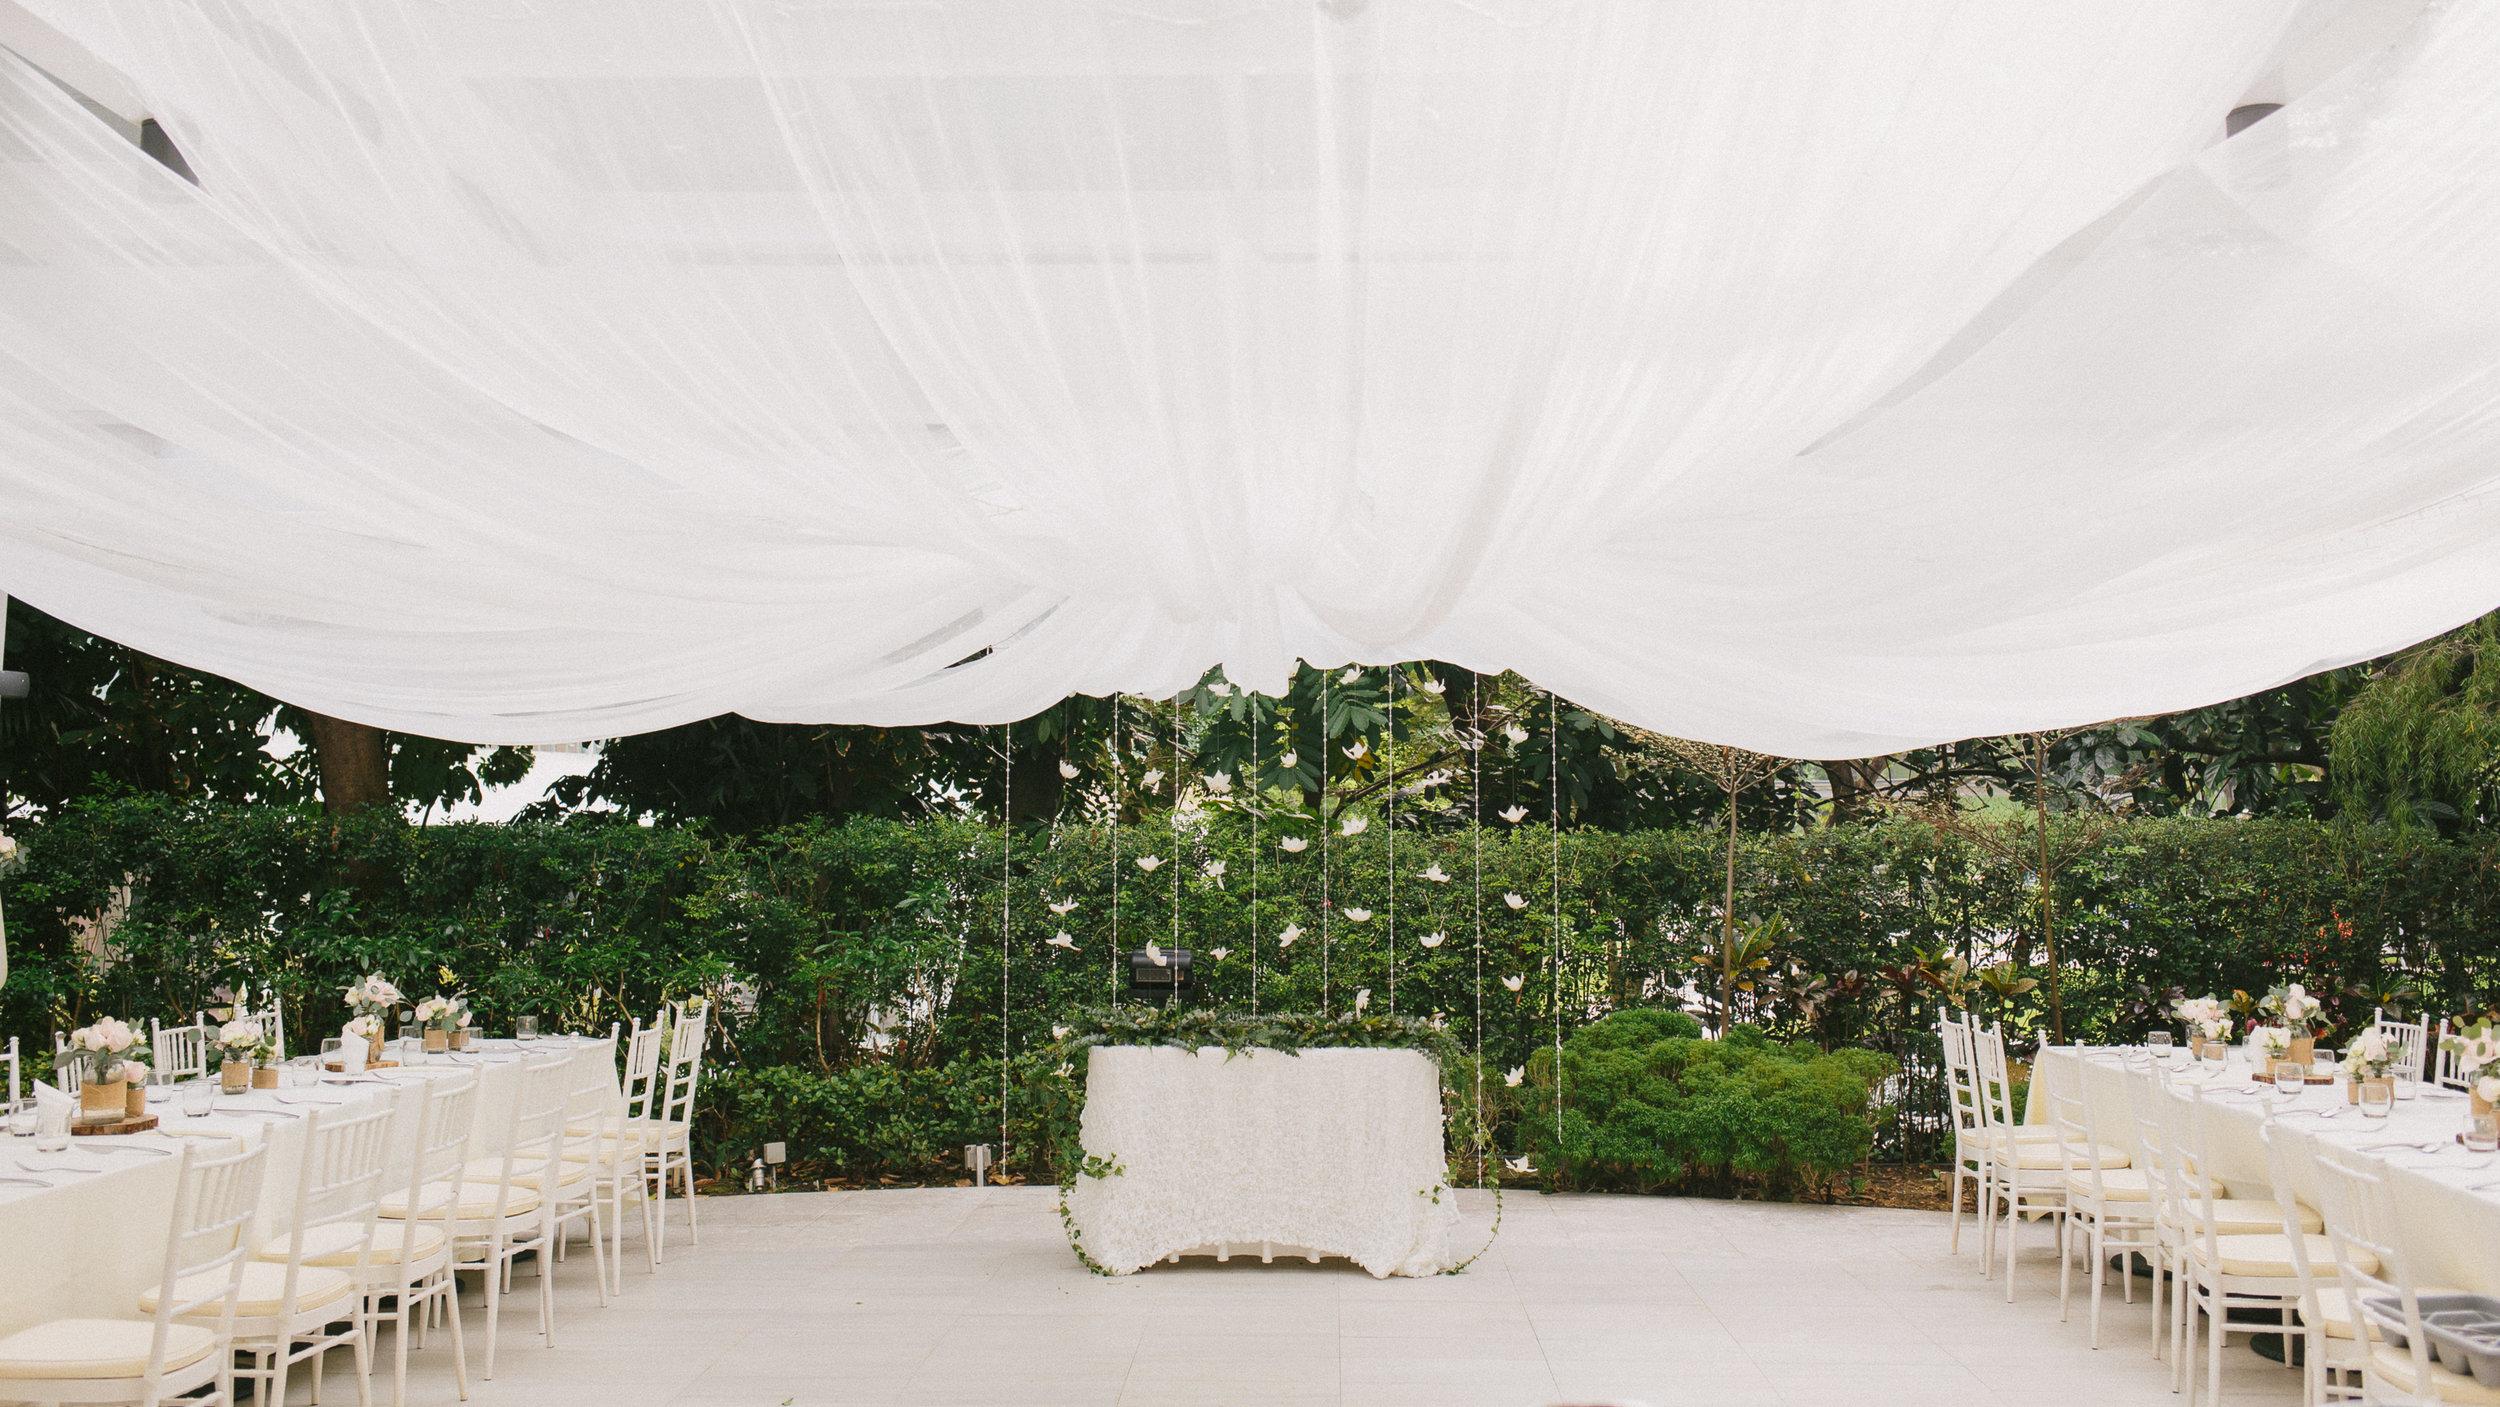 singapore-wedding-photographer-fadilah-kwan-003.jpg